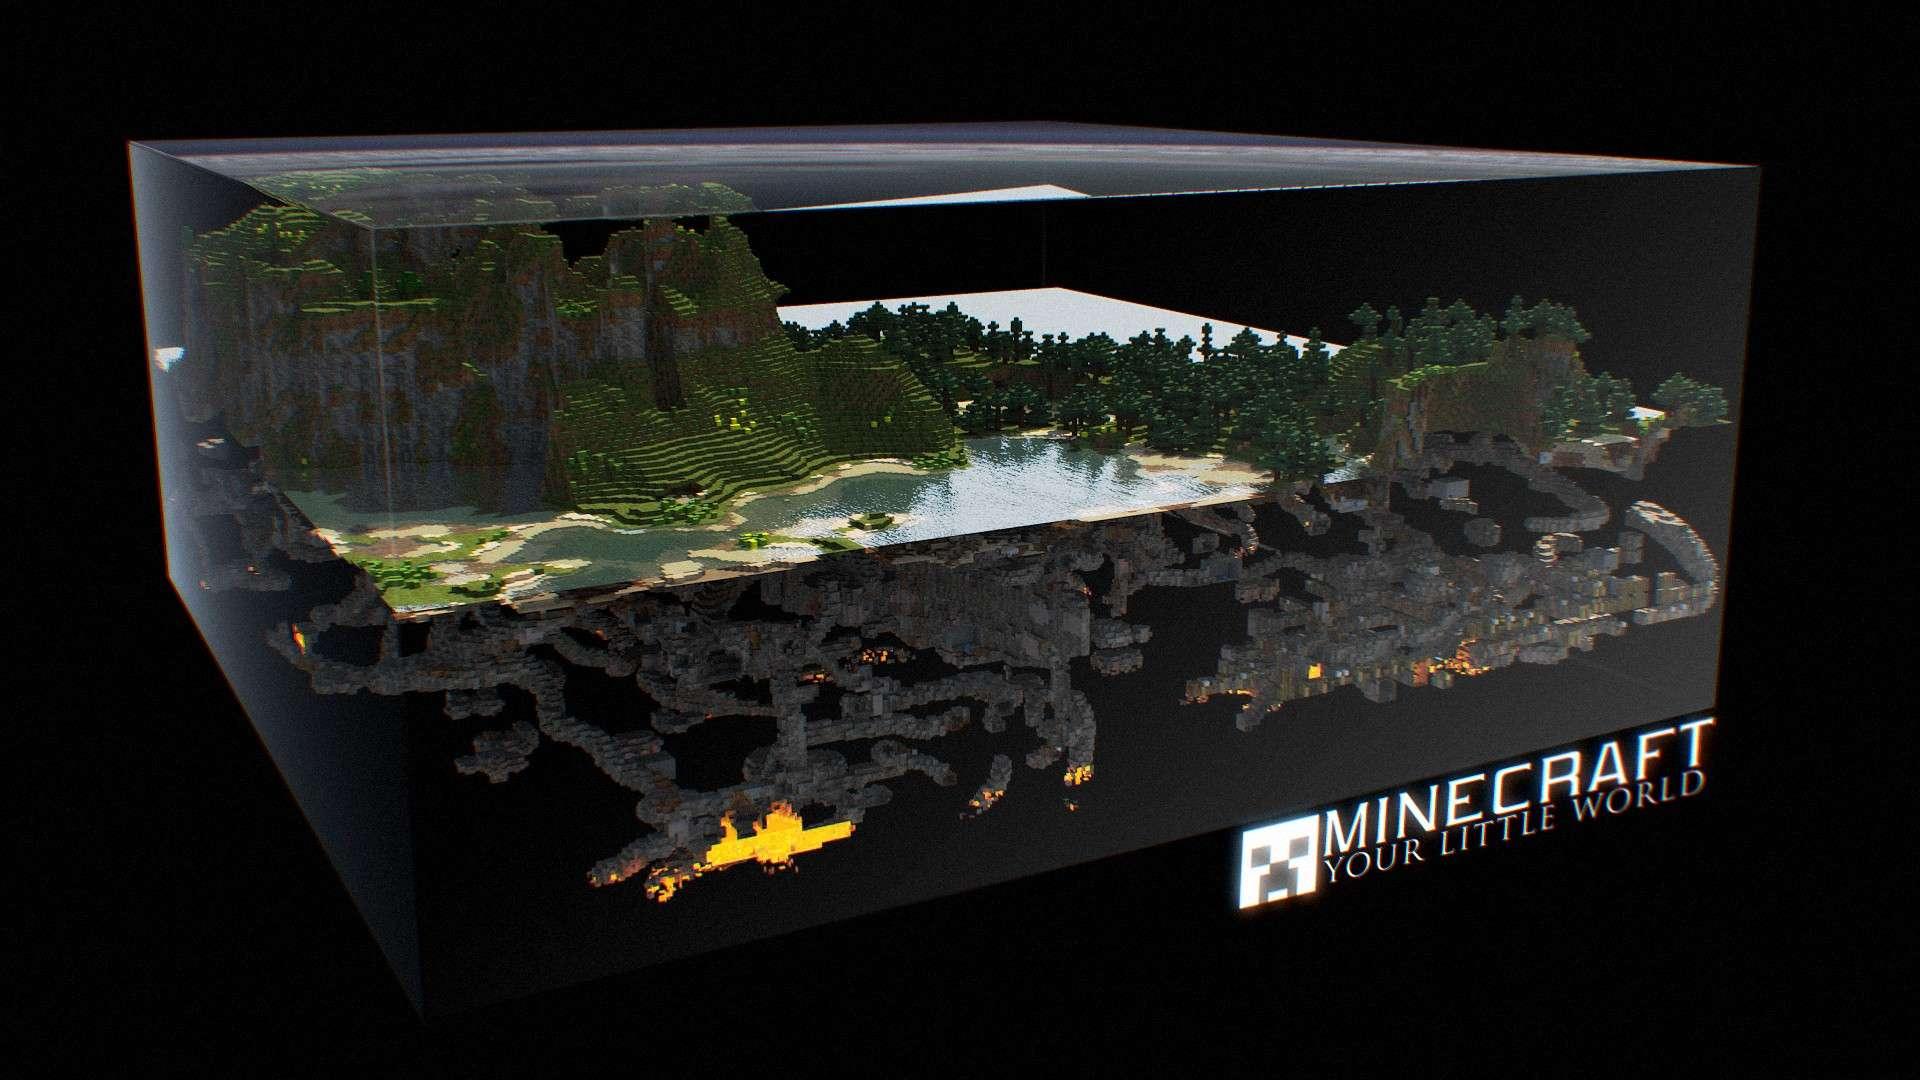 Minecraft 3D World HD Wallpaper » FullHDWpp - Full HD Wallpapers ...